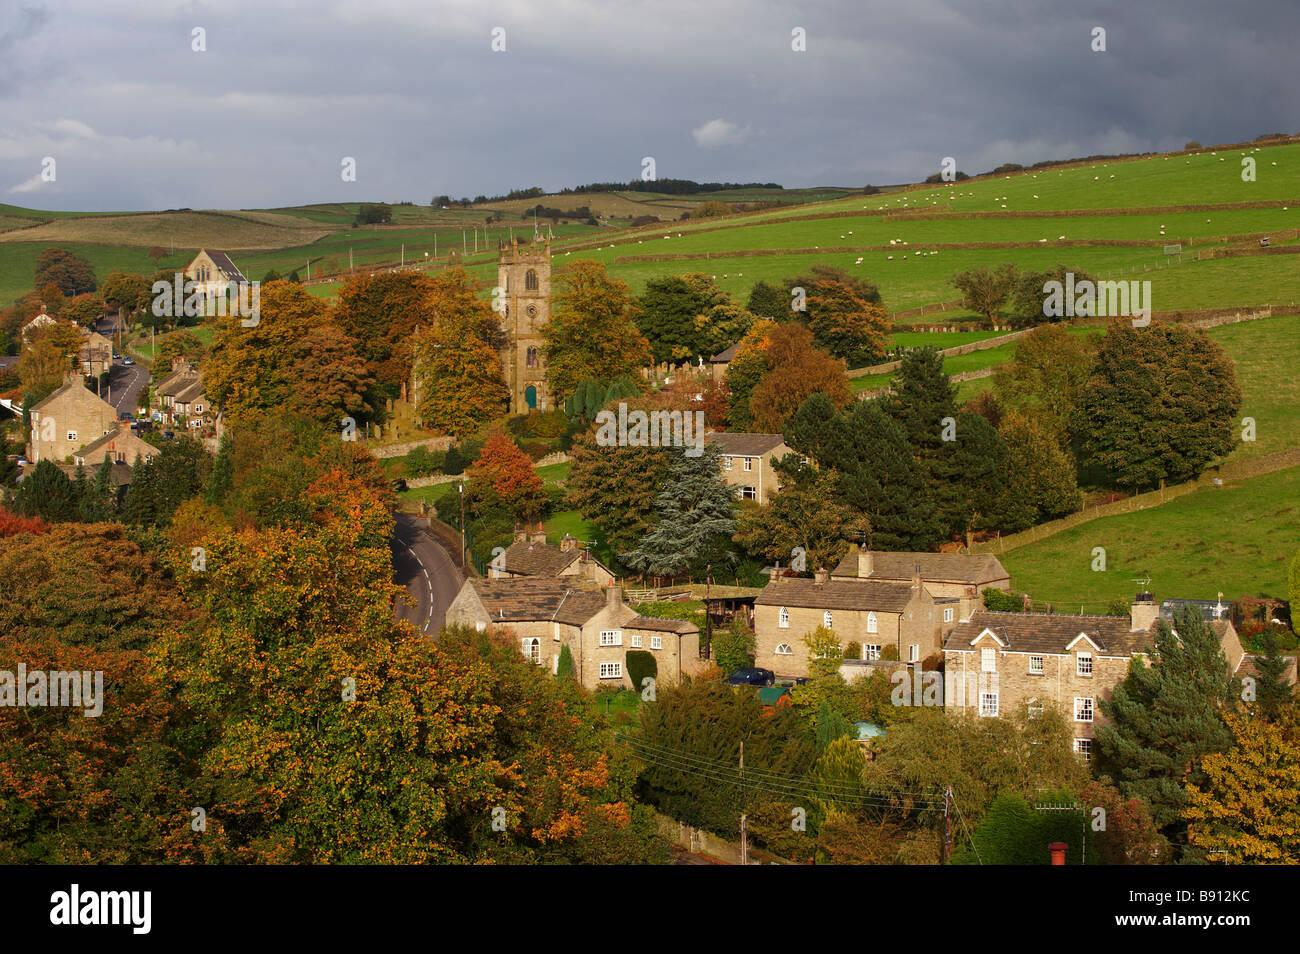 Rainow Village In Autumn Nr Macclesfield Cheshire UK - Stock Image